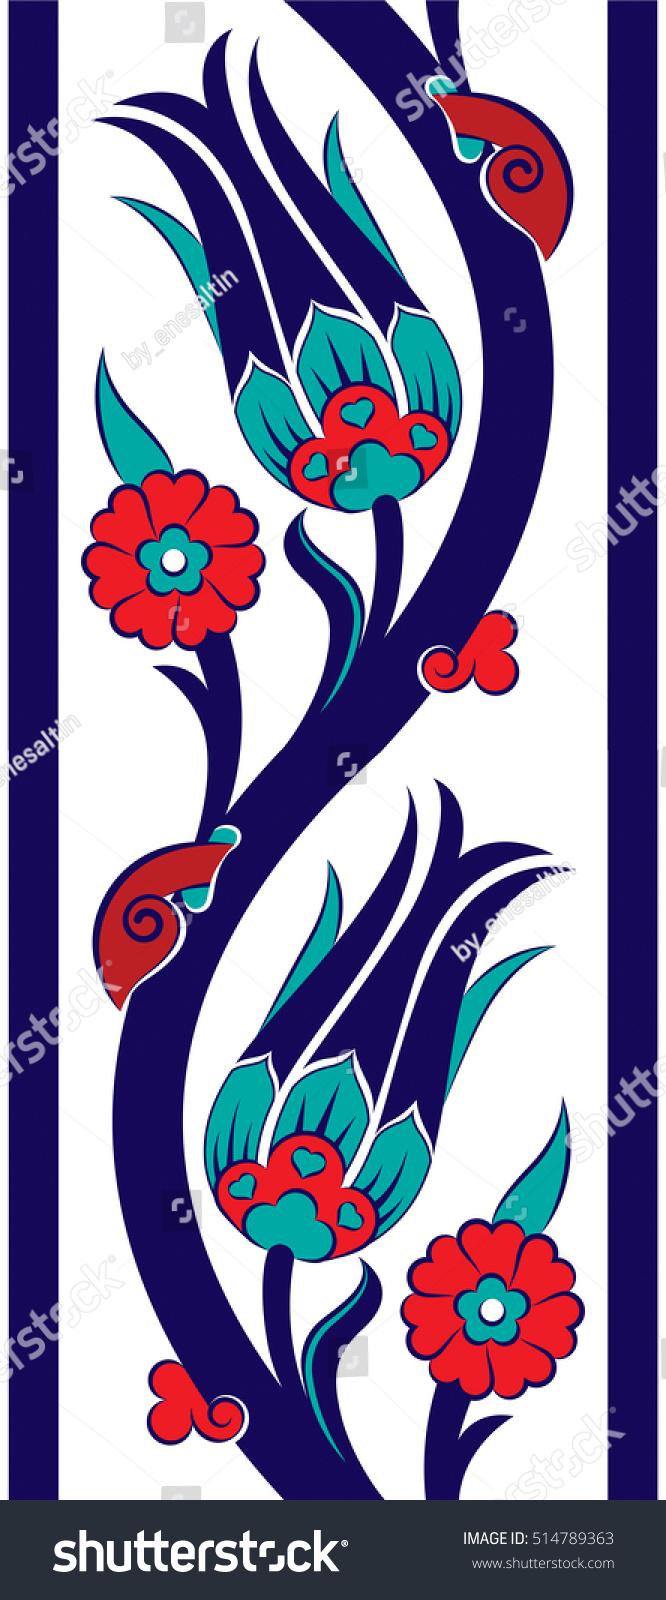 ottoman tile motif tulip bordure design stock vector. Black Bedroom Furniture Sets. Home Design Ideas